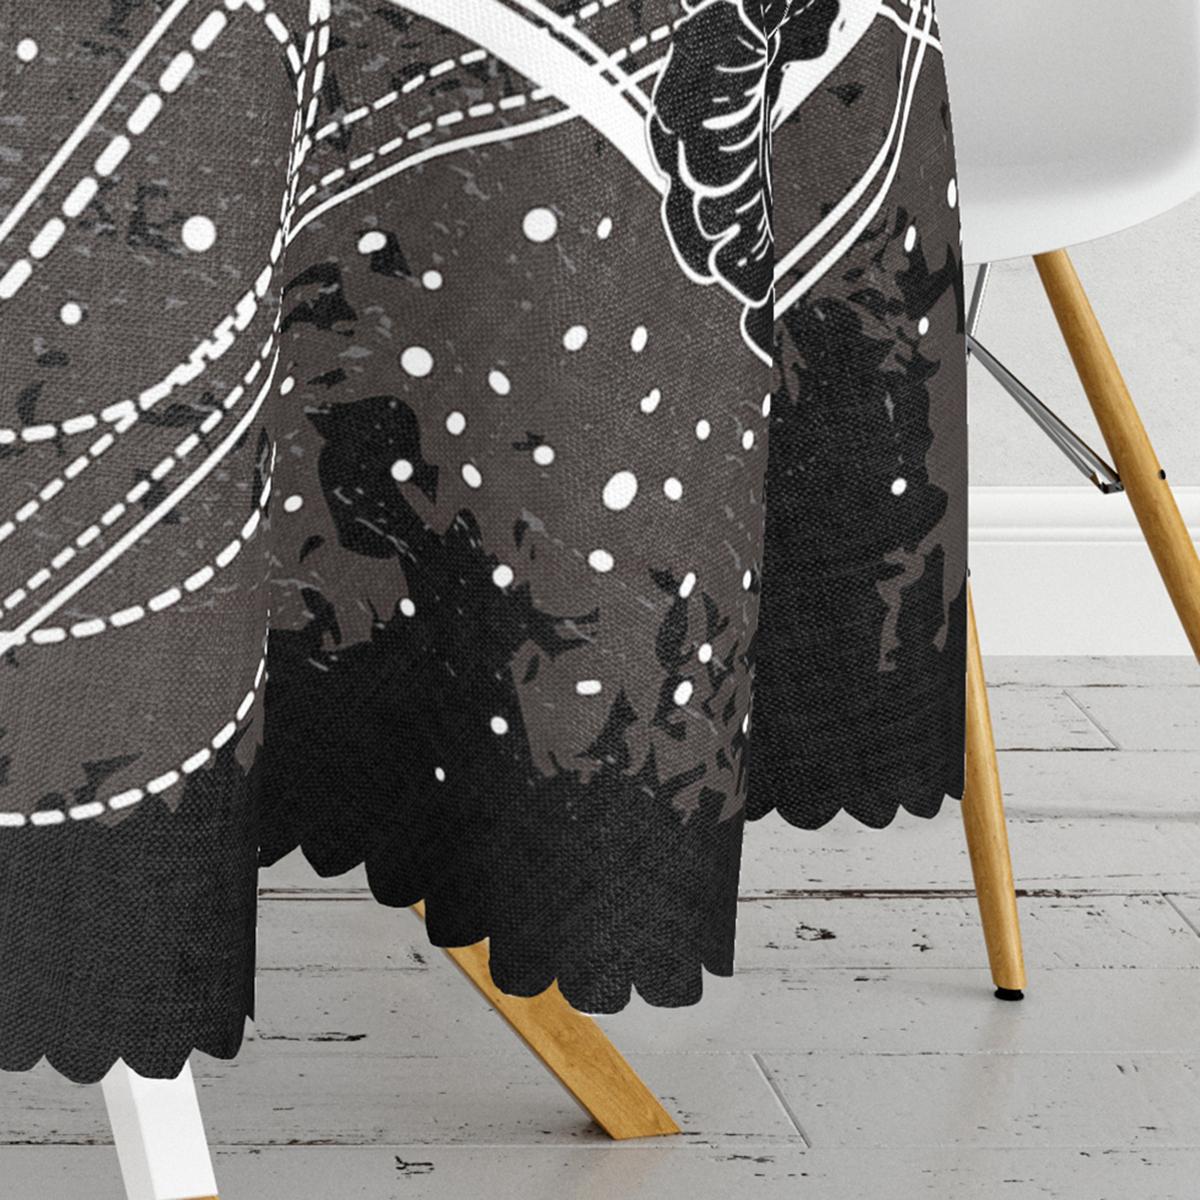 Siyah zeminde Beyaz Desenli Yuvarlak Masa Örtüsü - Çap 140cm Realhomes